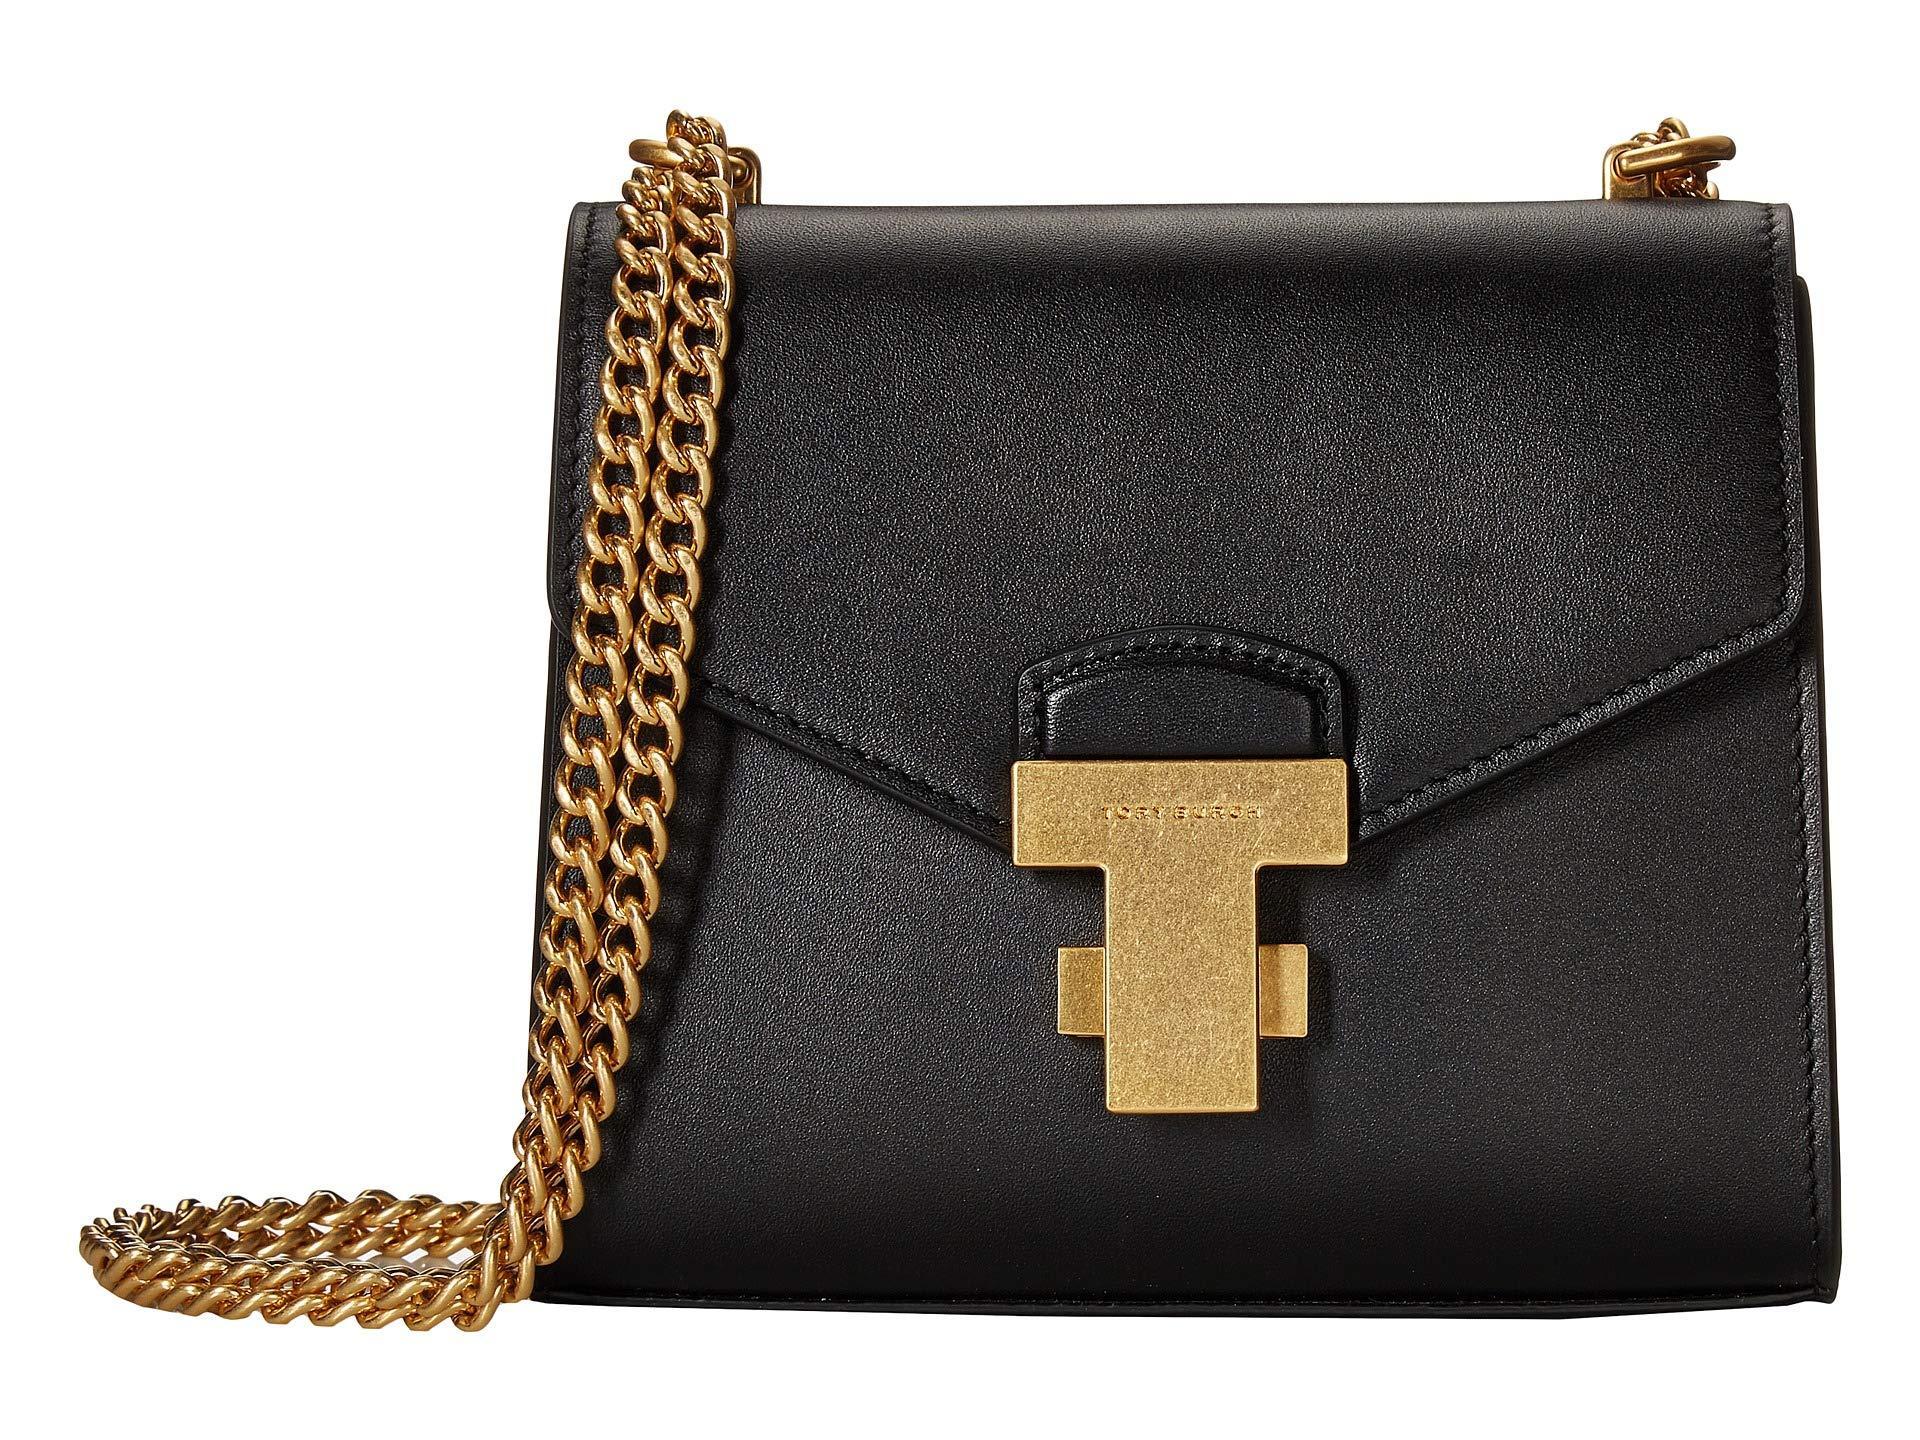 158c3f7769bd Tory Burch. Women s Juliette Chain Mini Bag (black) Cross Body Handbags